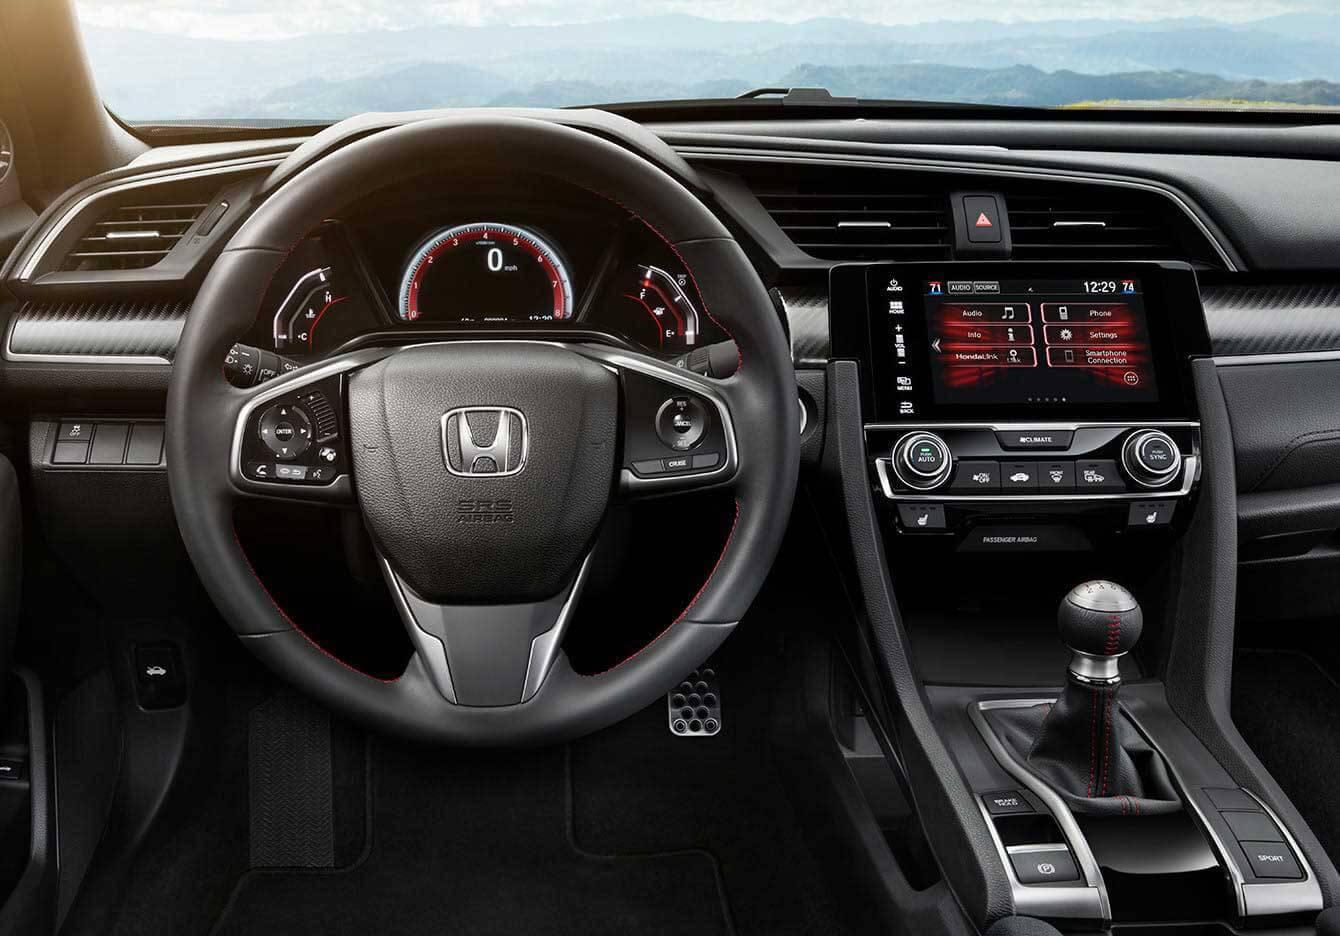 2017 Honda Civic Si Sedan Interior Driver POV